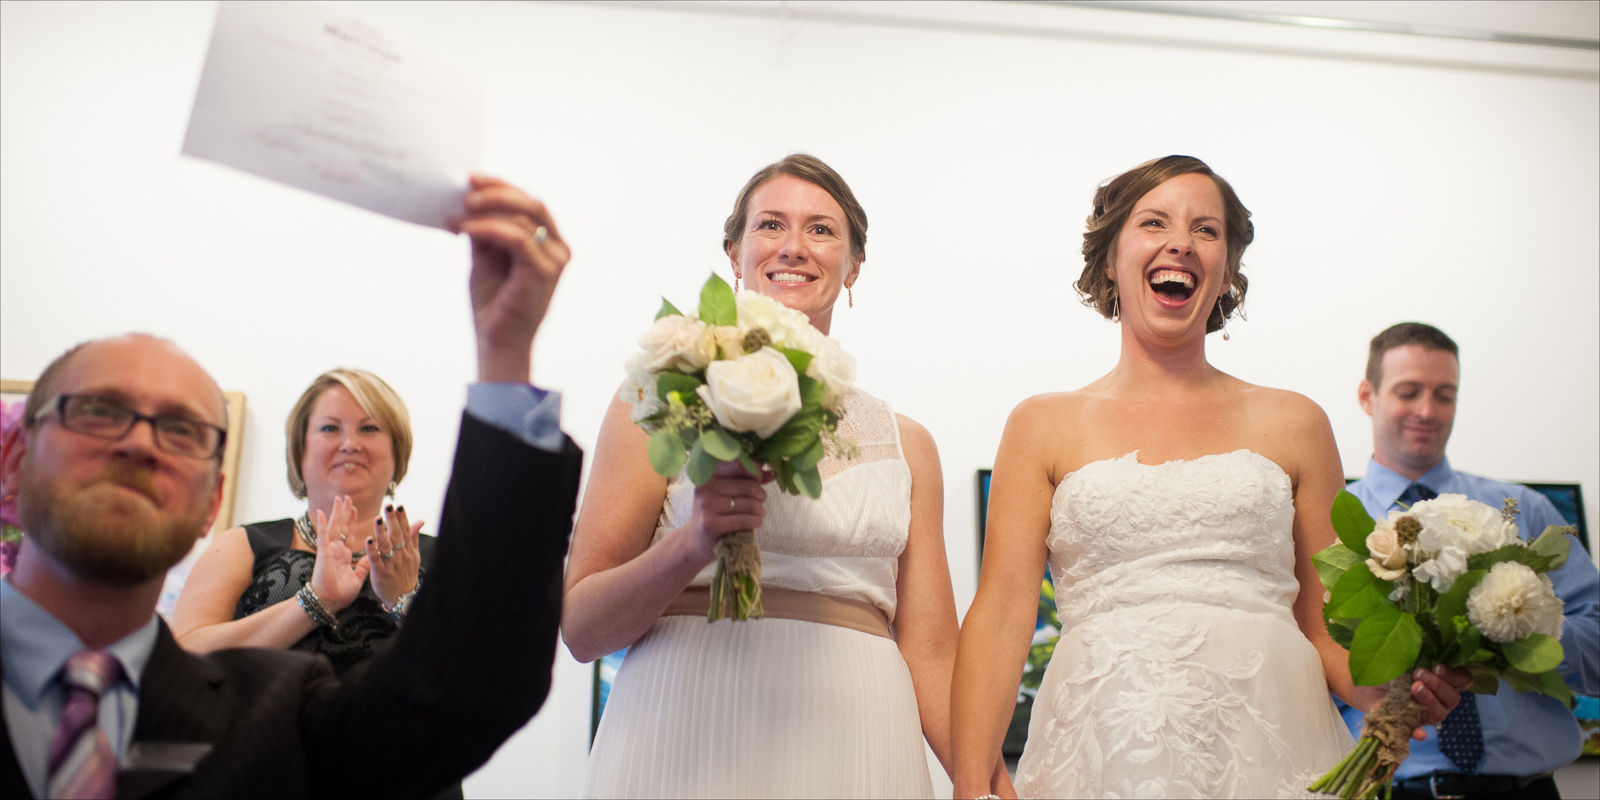 collingwood-wedding-photo-album-014.jpg